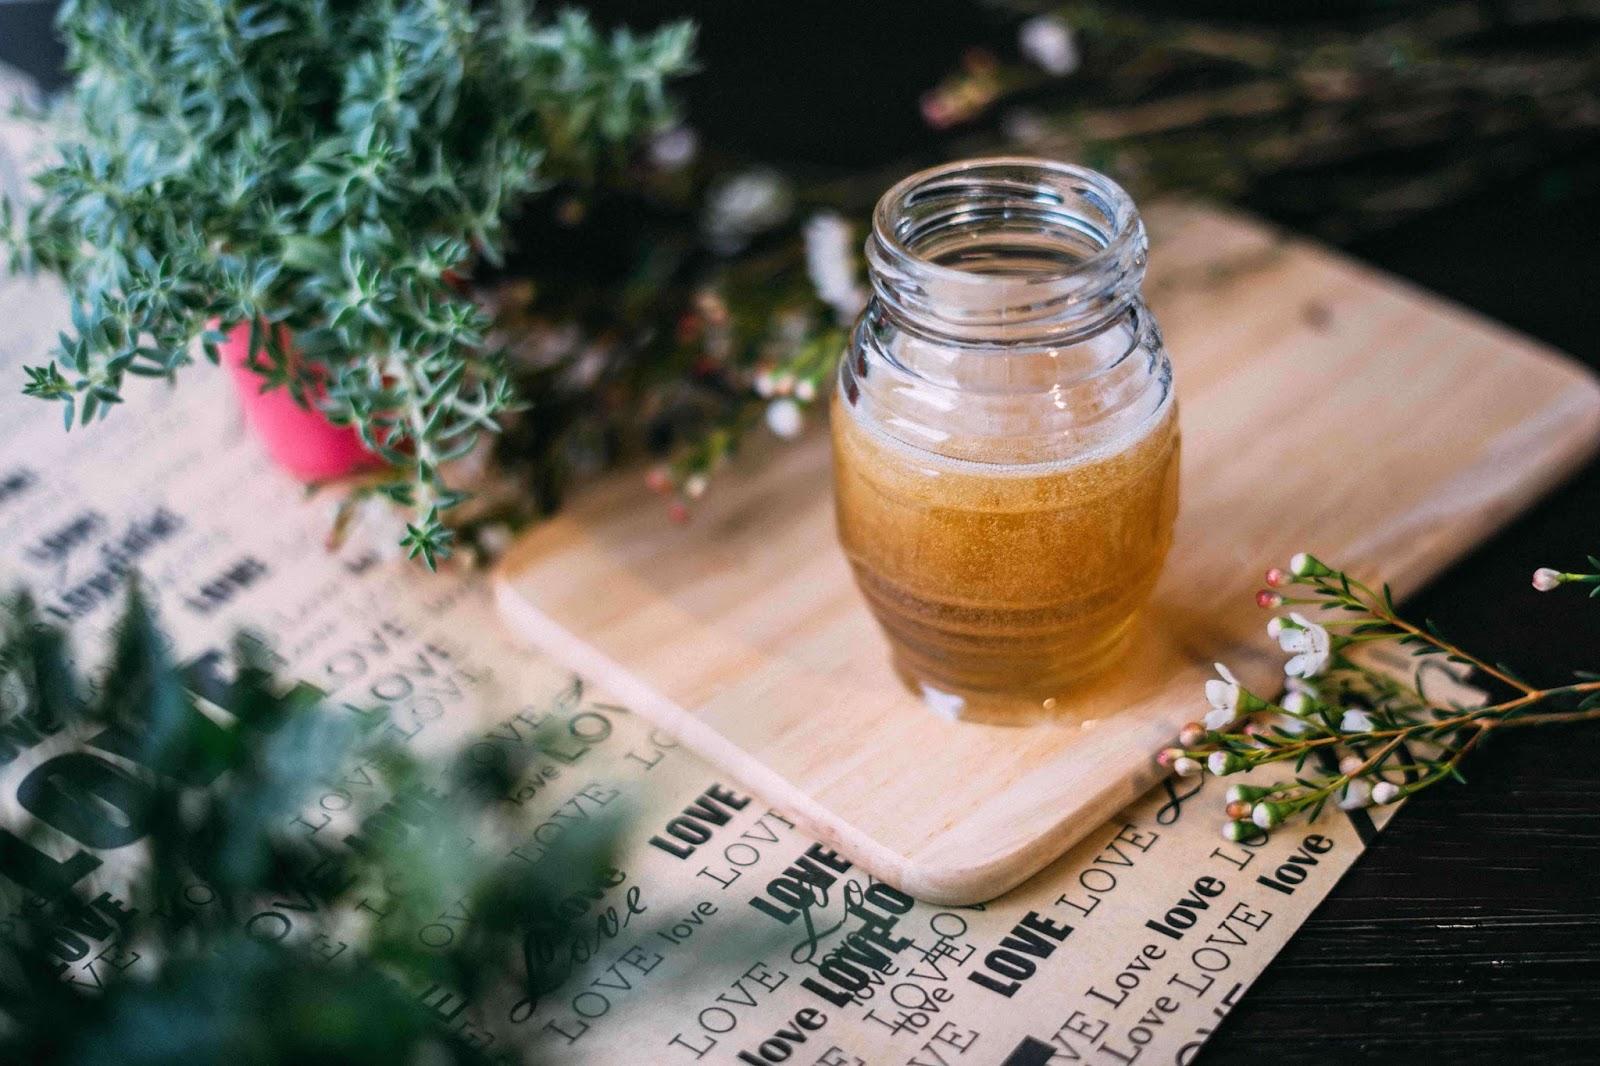 Honig Kokosöl Haarkur selbermachen